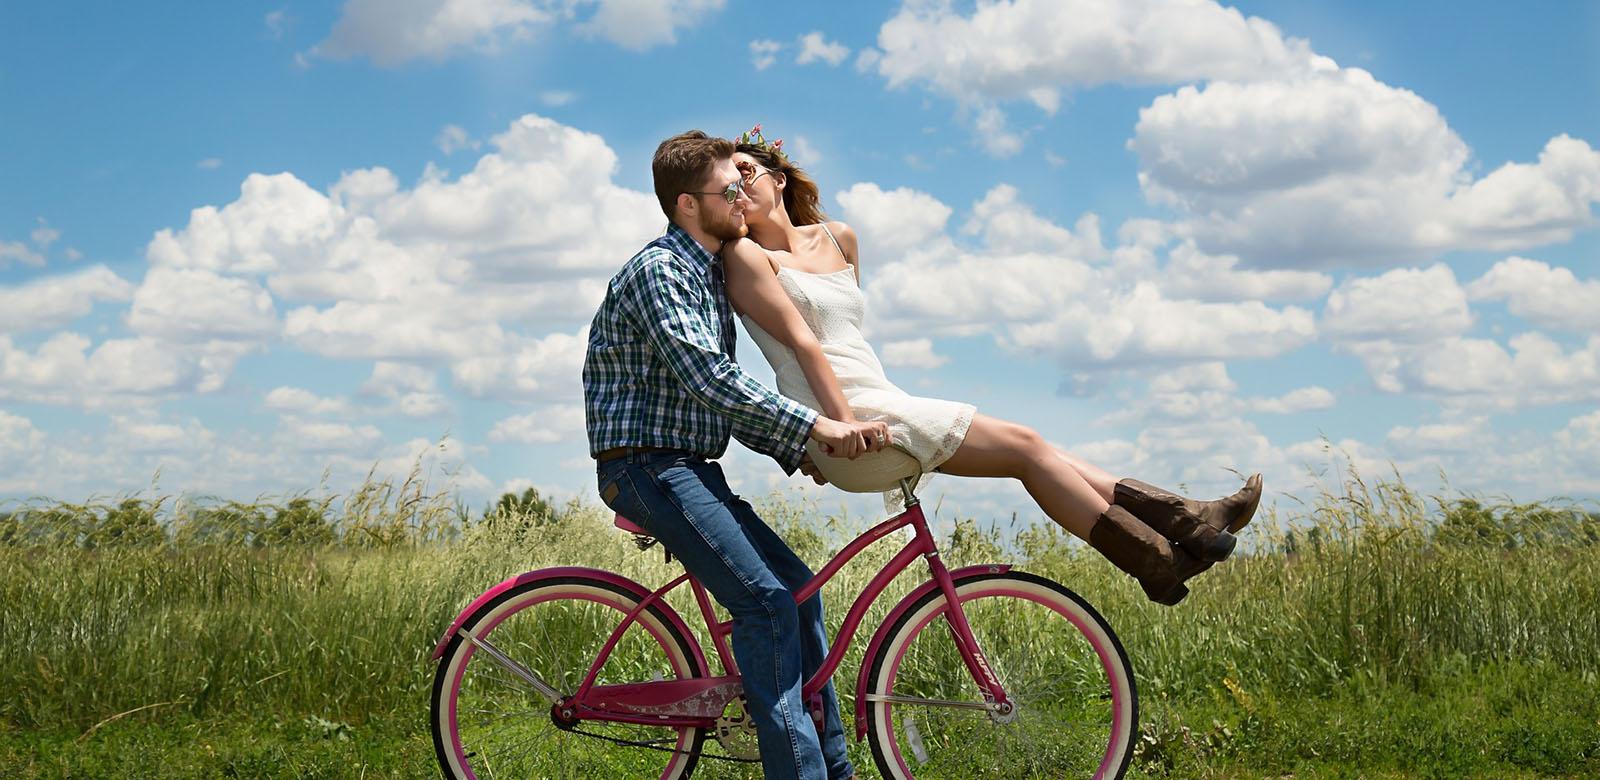 vélo couple paysage